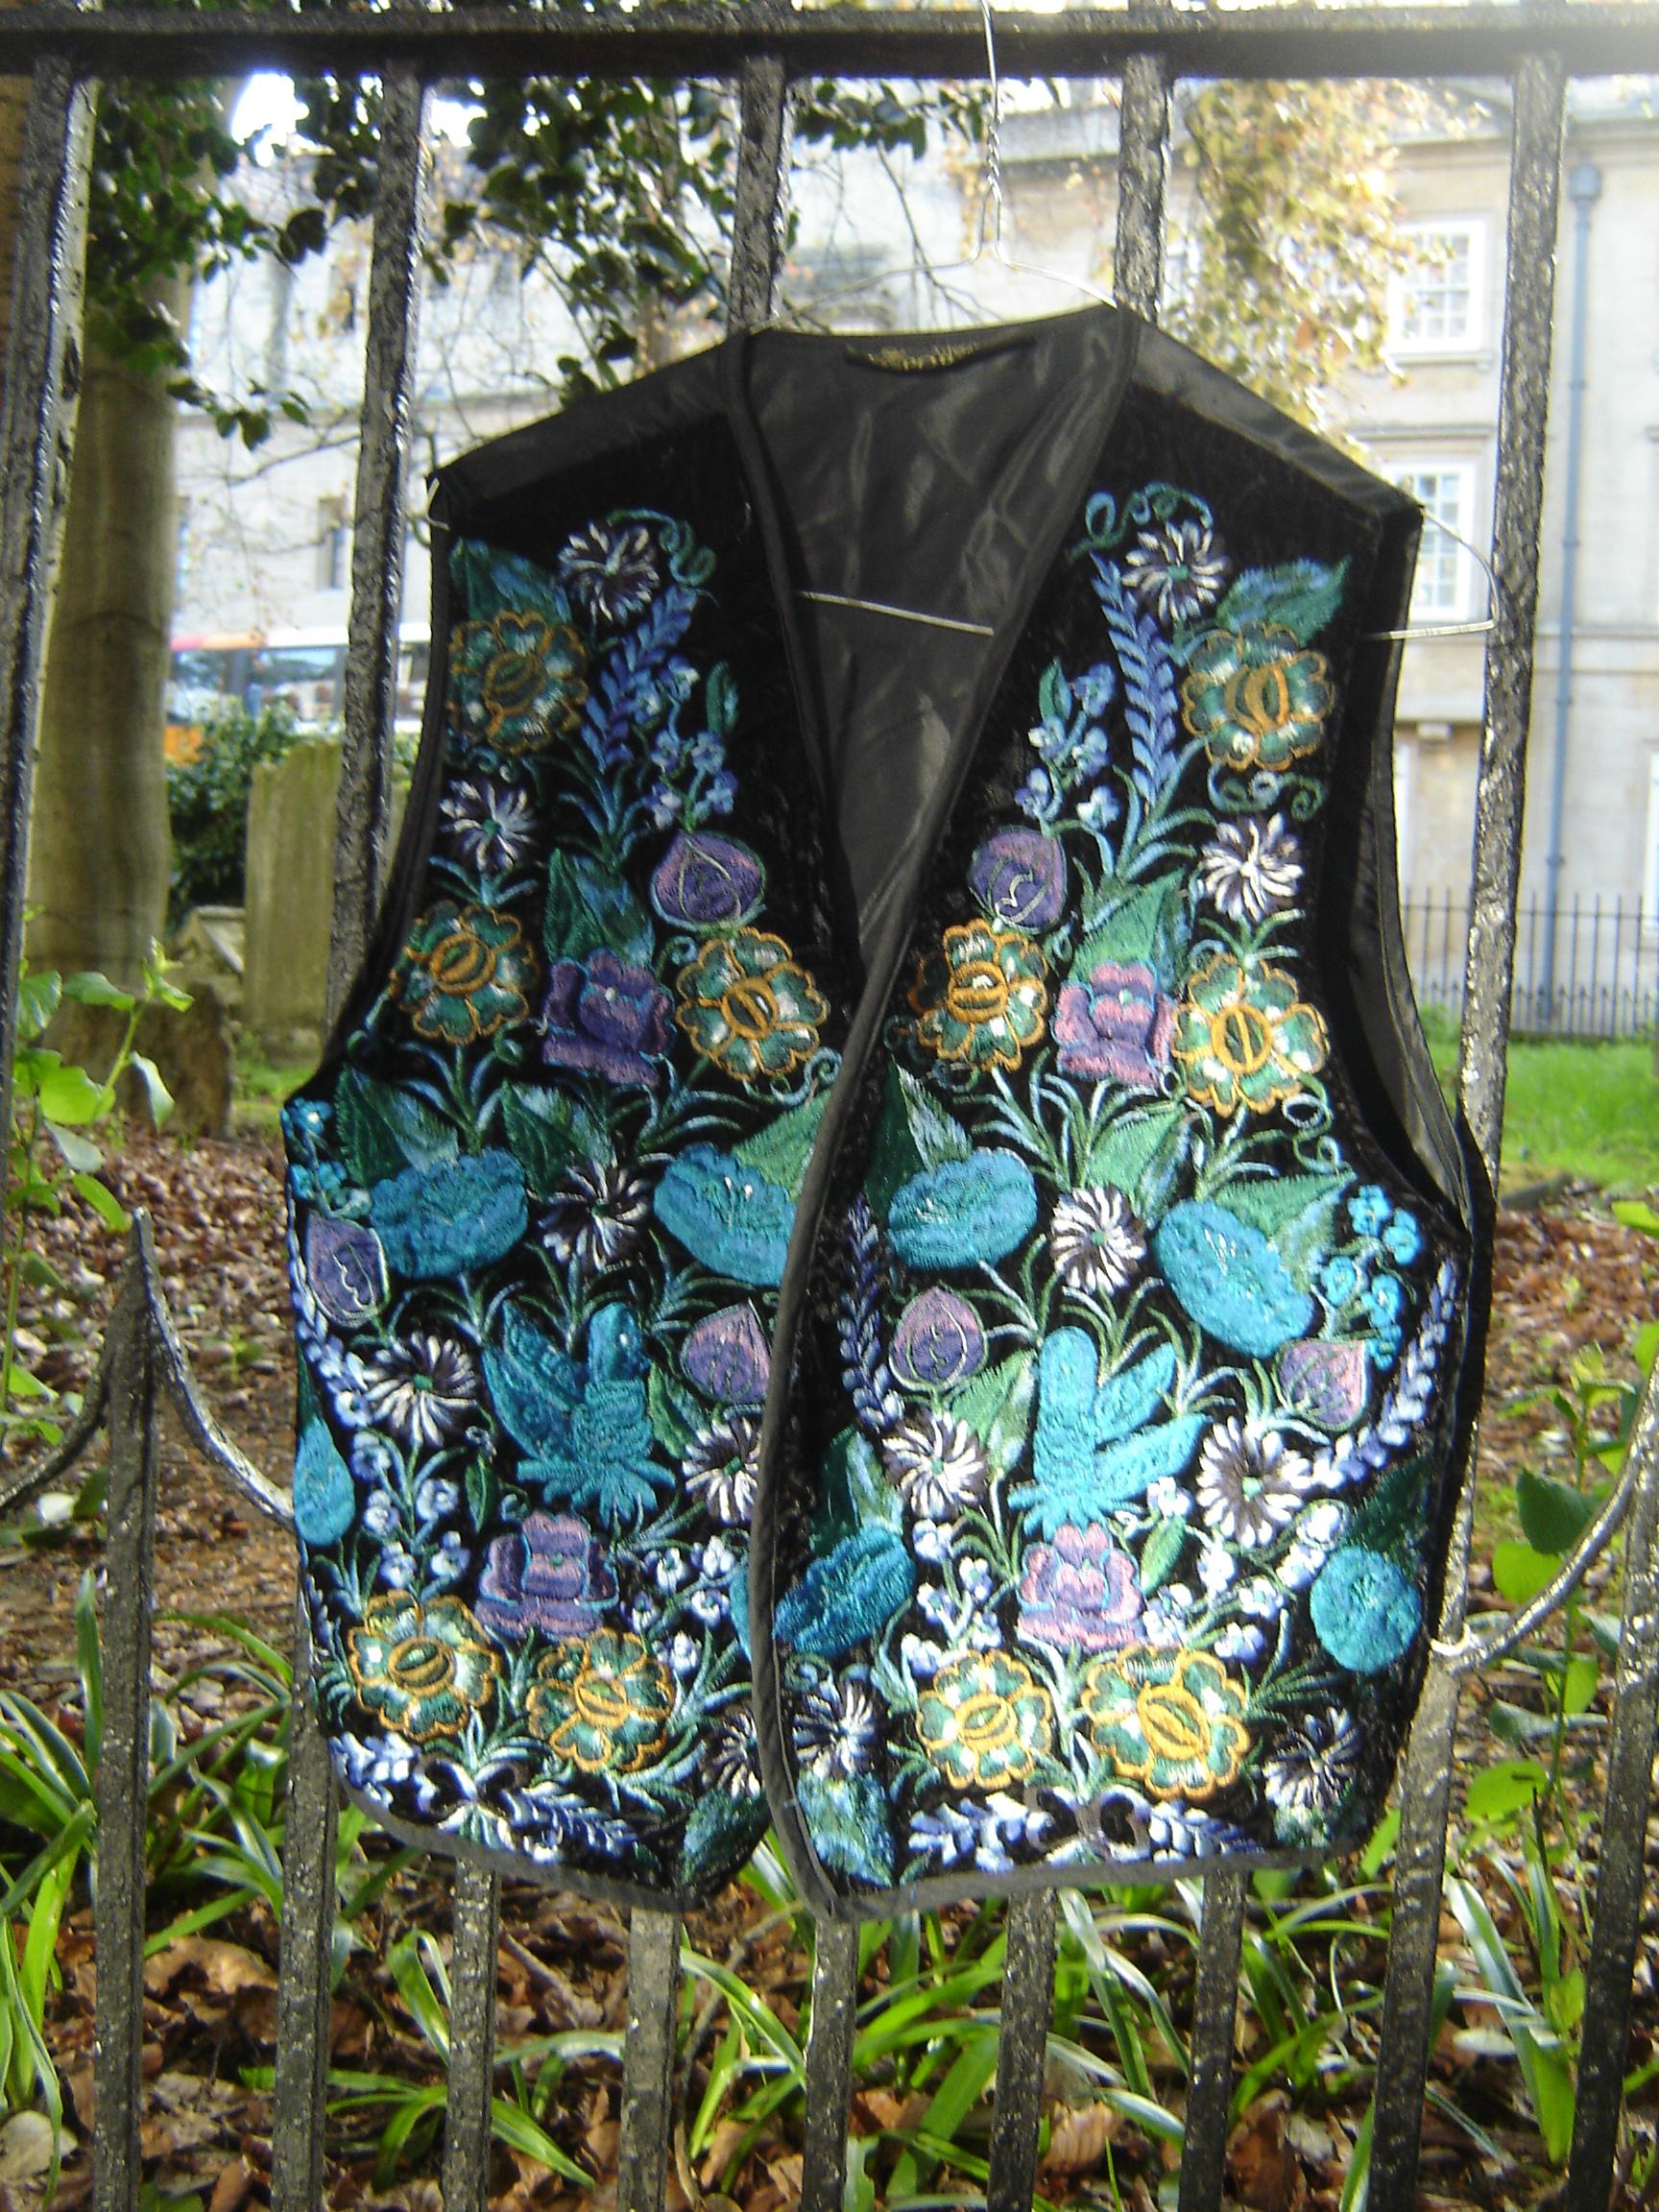 Artesania Pop Wuh embroidered waistcoat, from Unicorn, 5 Ship Street, Oxford